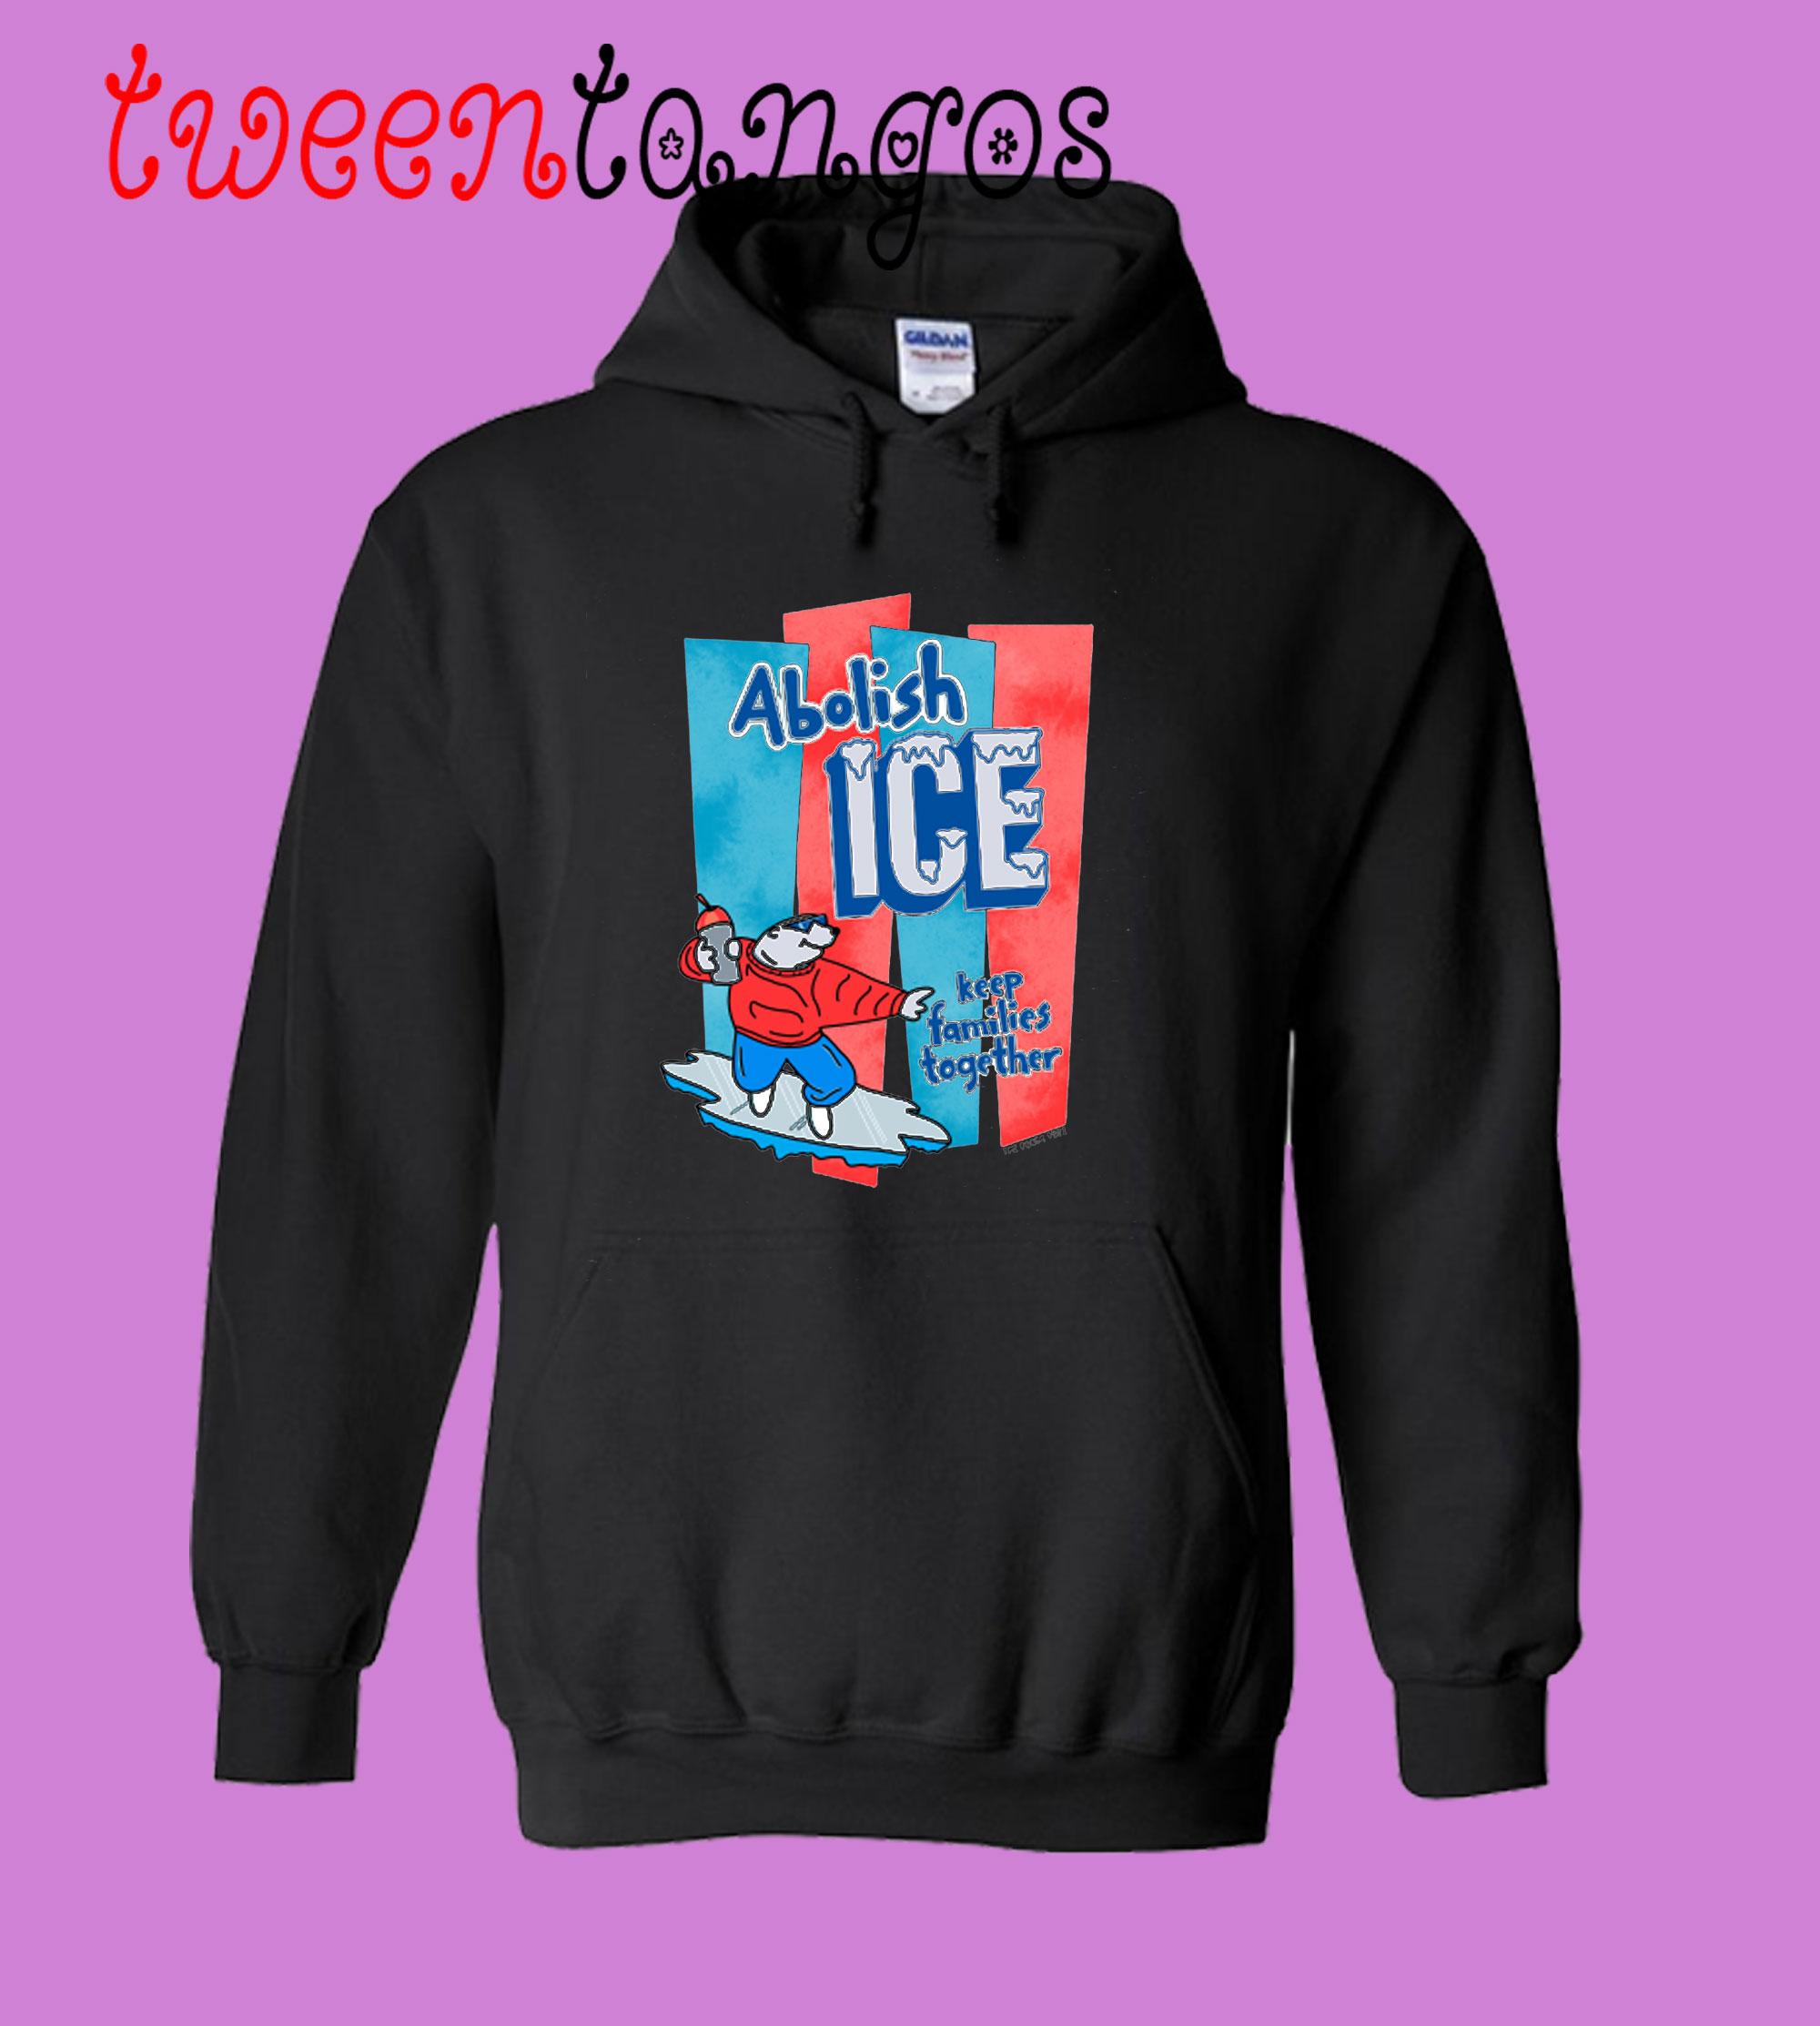 Abolish-Ice-Hoodie